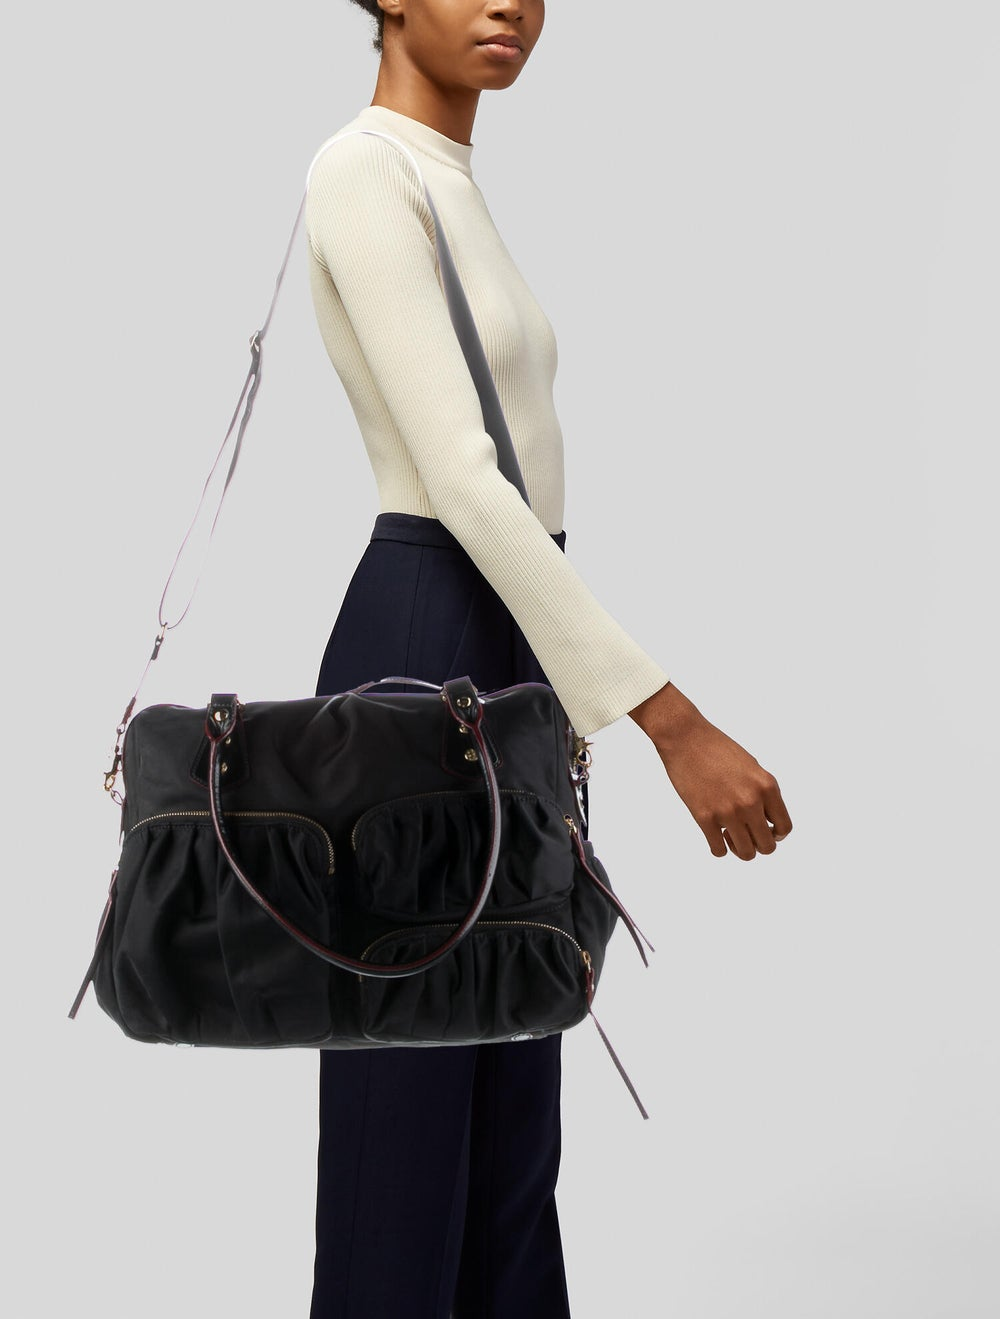 MZ Wallace Leather-Trimmed Nylon Shoulder Bag Bla… - image 2